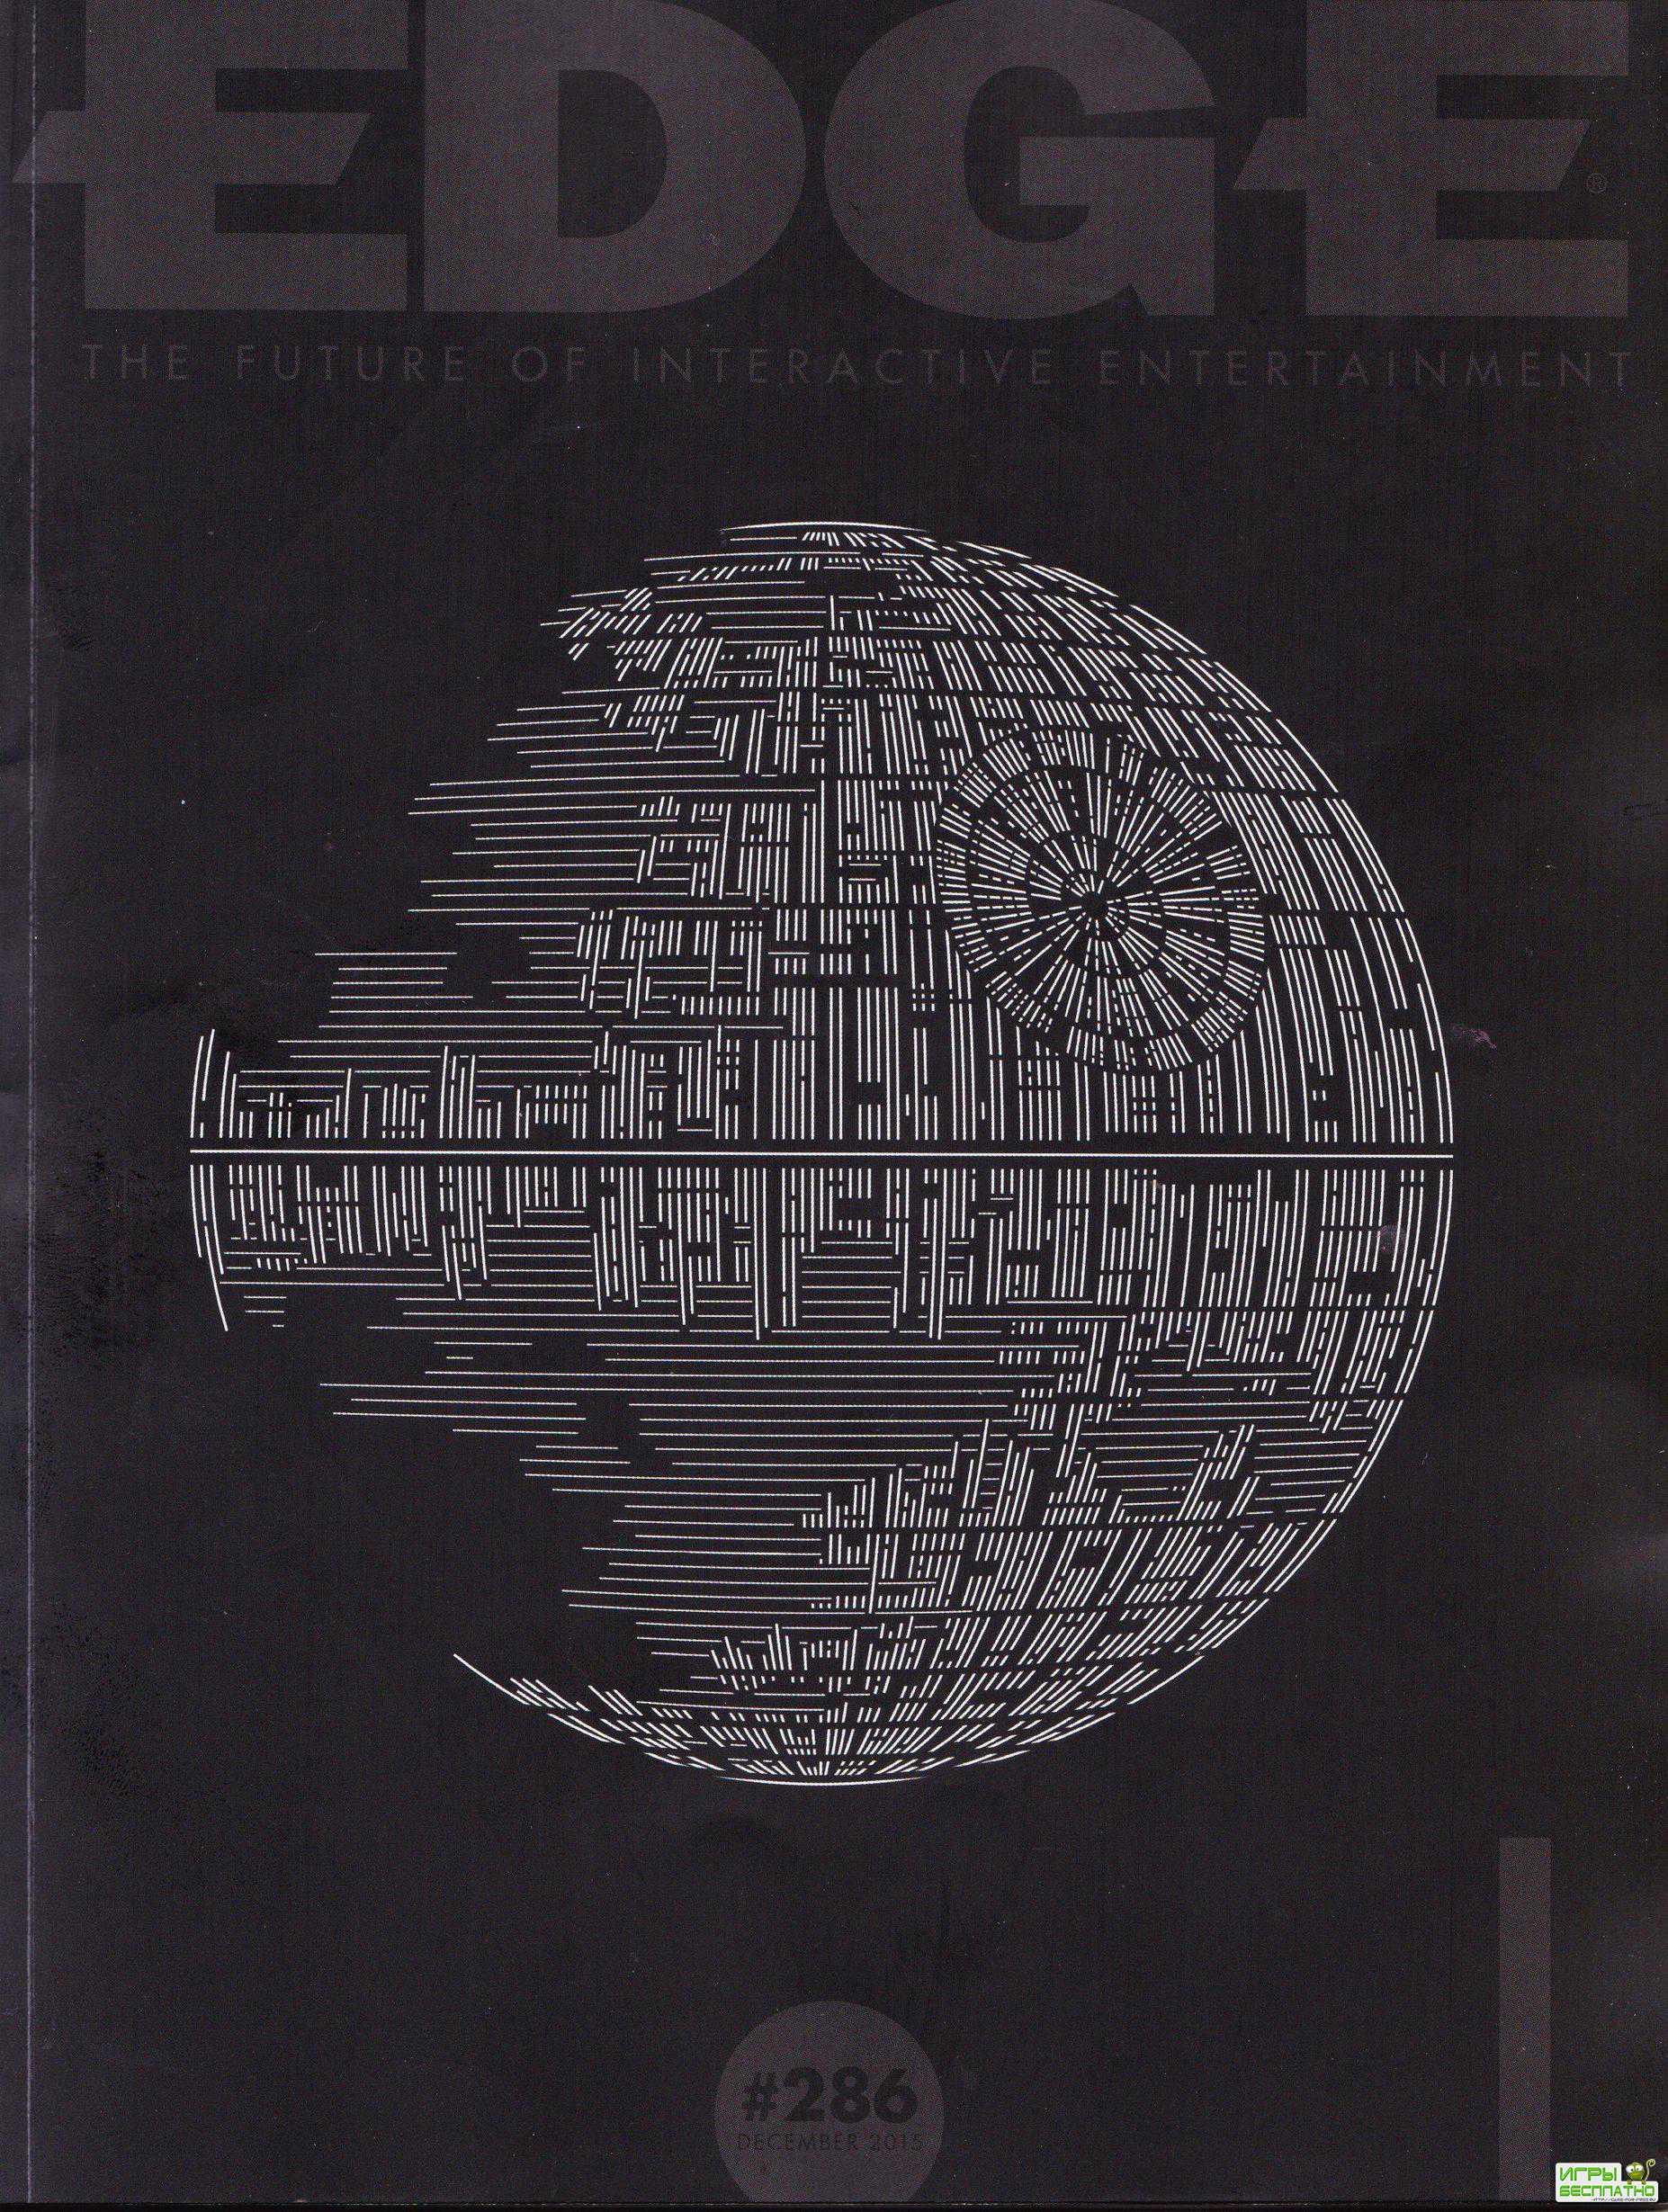 Оценки свежего номера EDGE: SOMA, Rock Band 4 и другие, на обложке представ ...